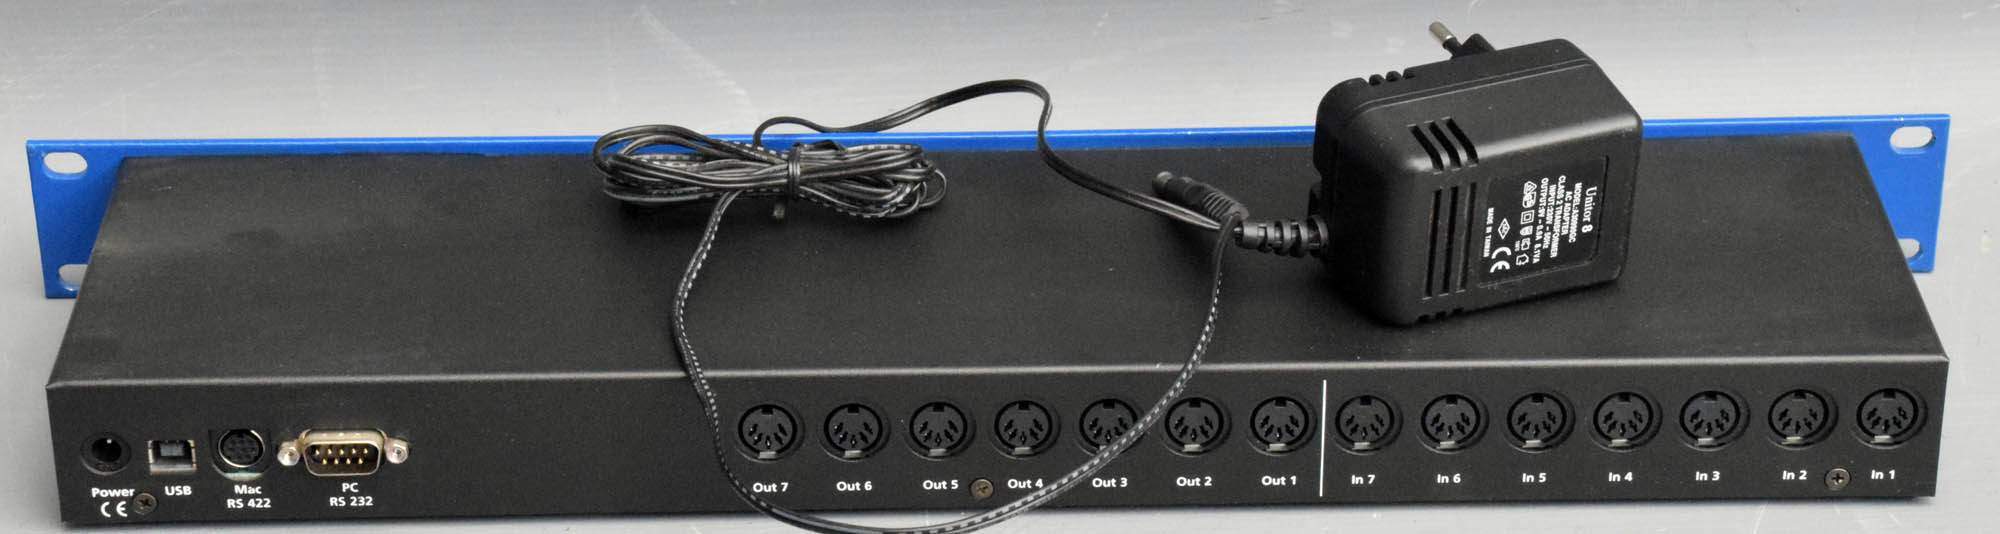 Emagic Amt8 Midi Interface W/ Power Supply Pro Audio Equipment